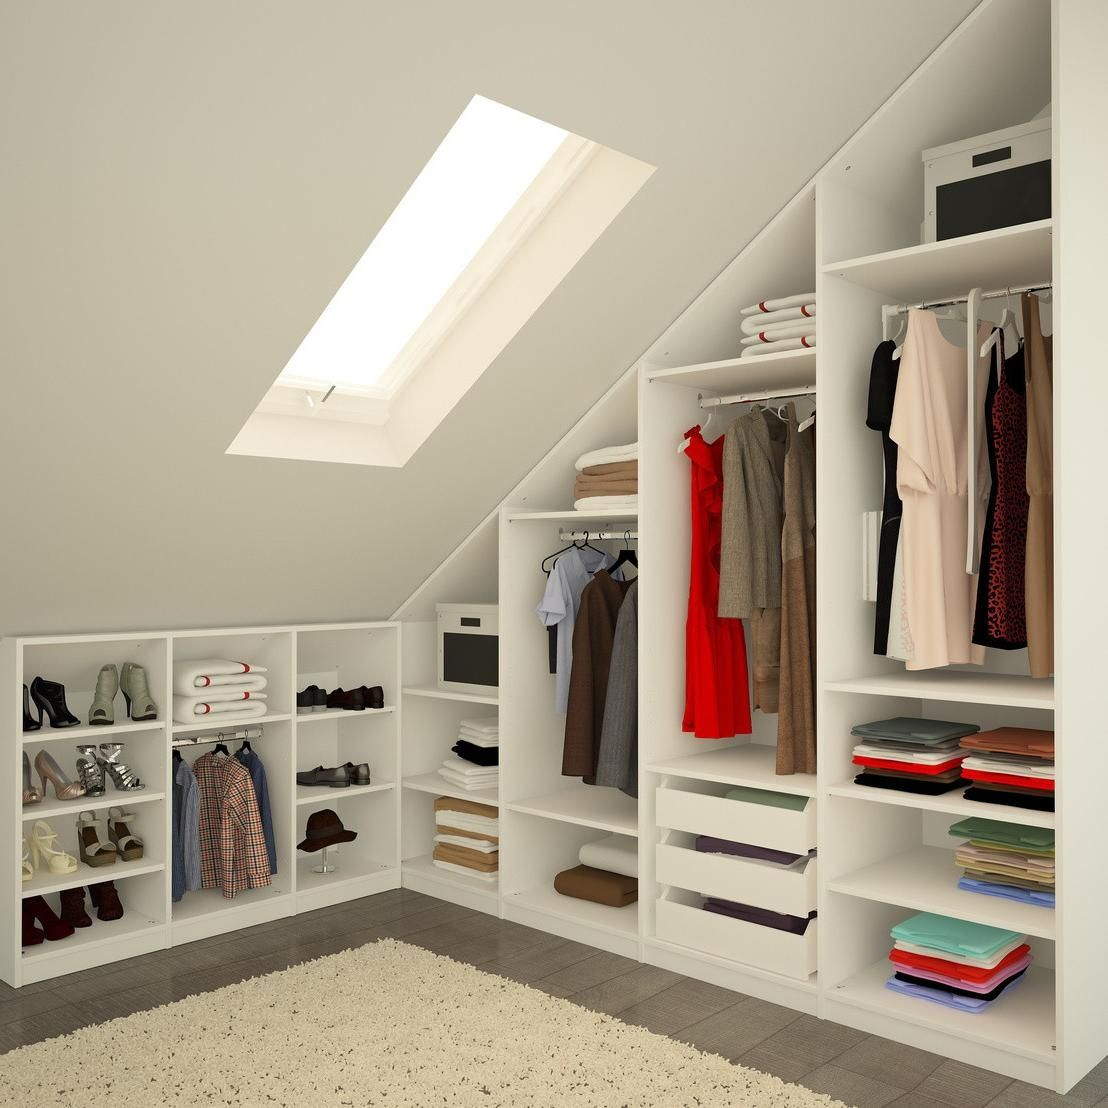 Small Attic Bedroom Closet   Small Bedroom   Pinterest ...